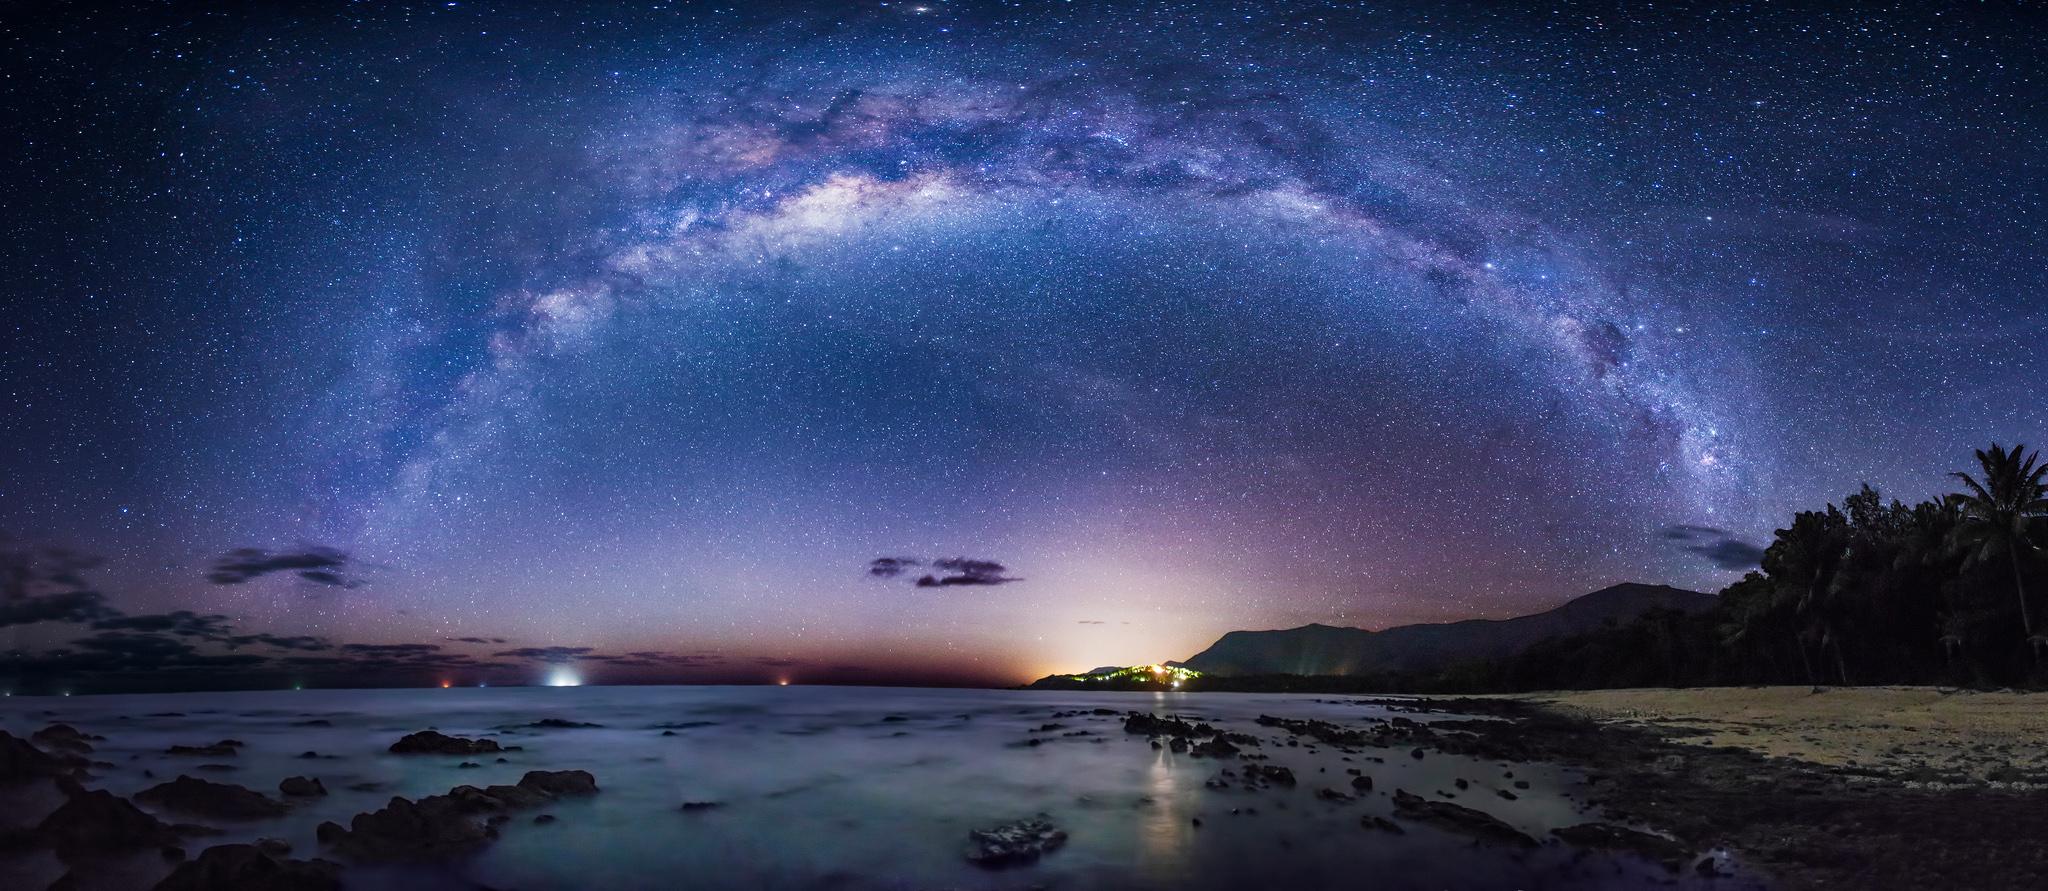 Amazing Milky Way Wallpapers: Milky Way Galaxy Wallpaper